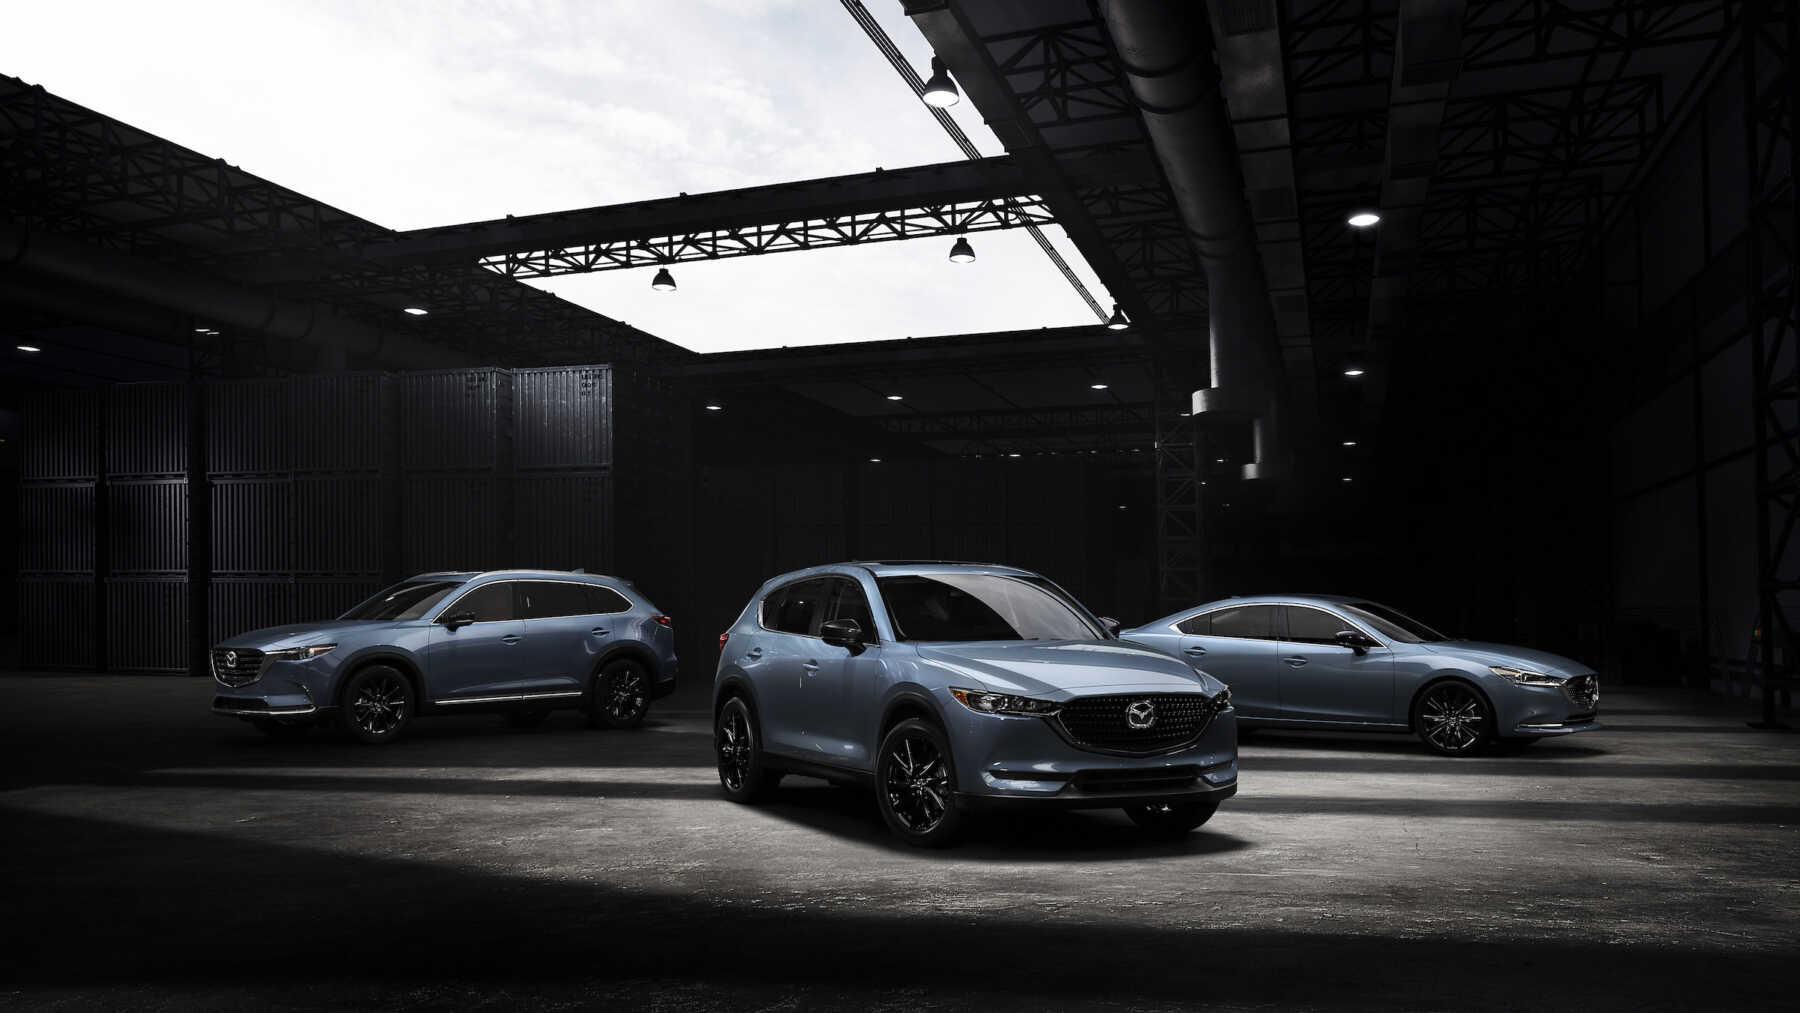 Mazda Canada Inc--New Kuro Edition Launches for Select Mazda Veh